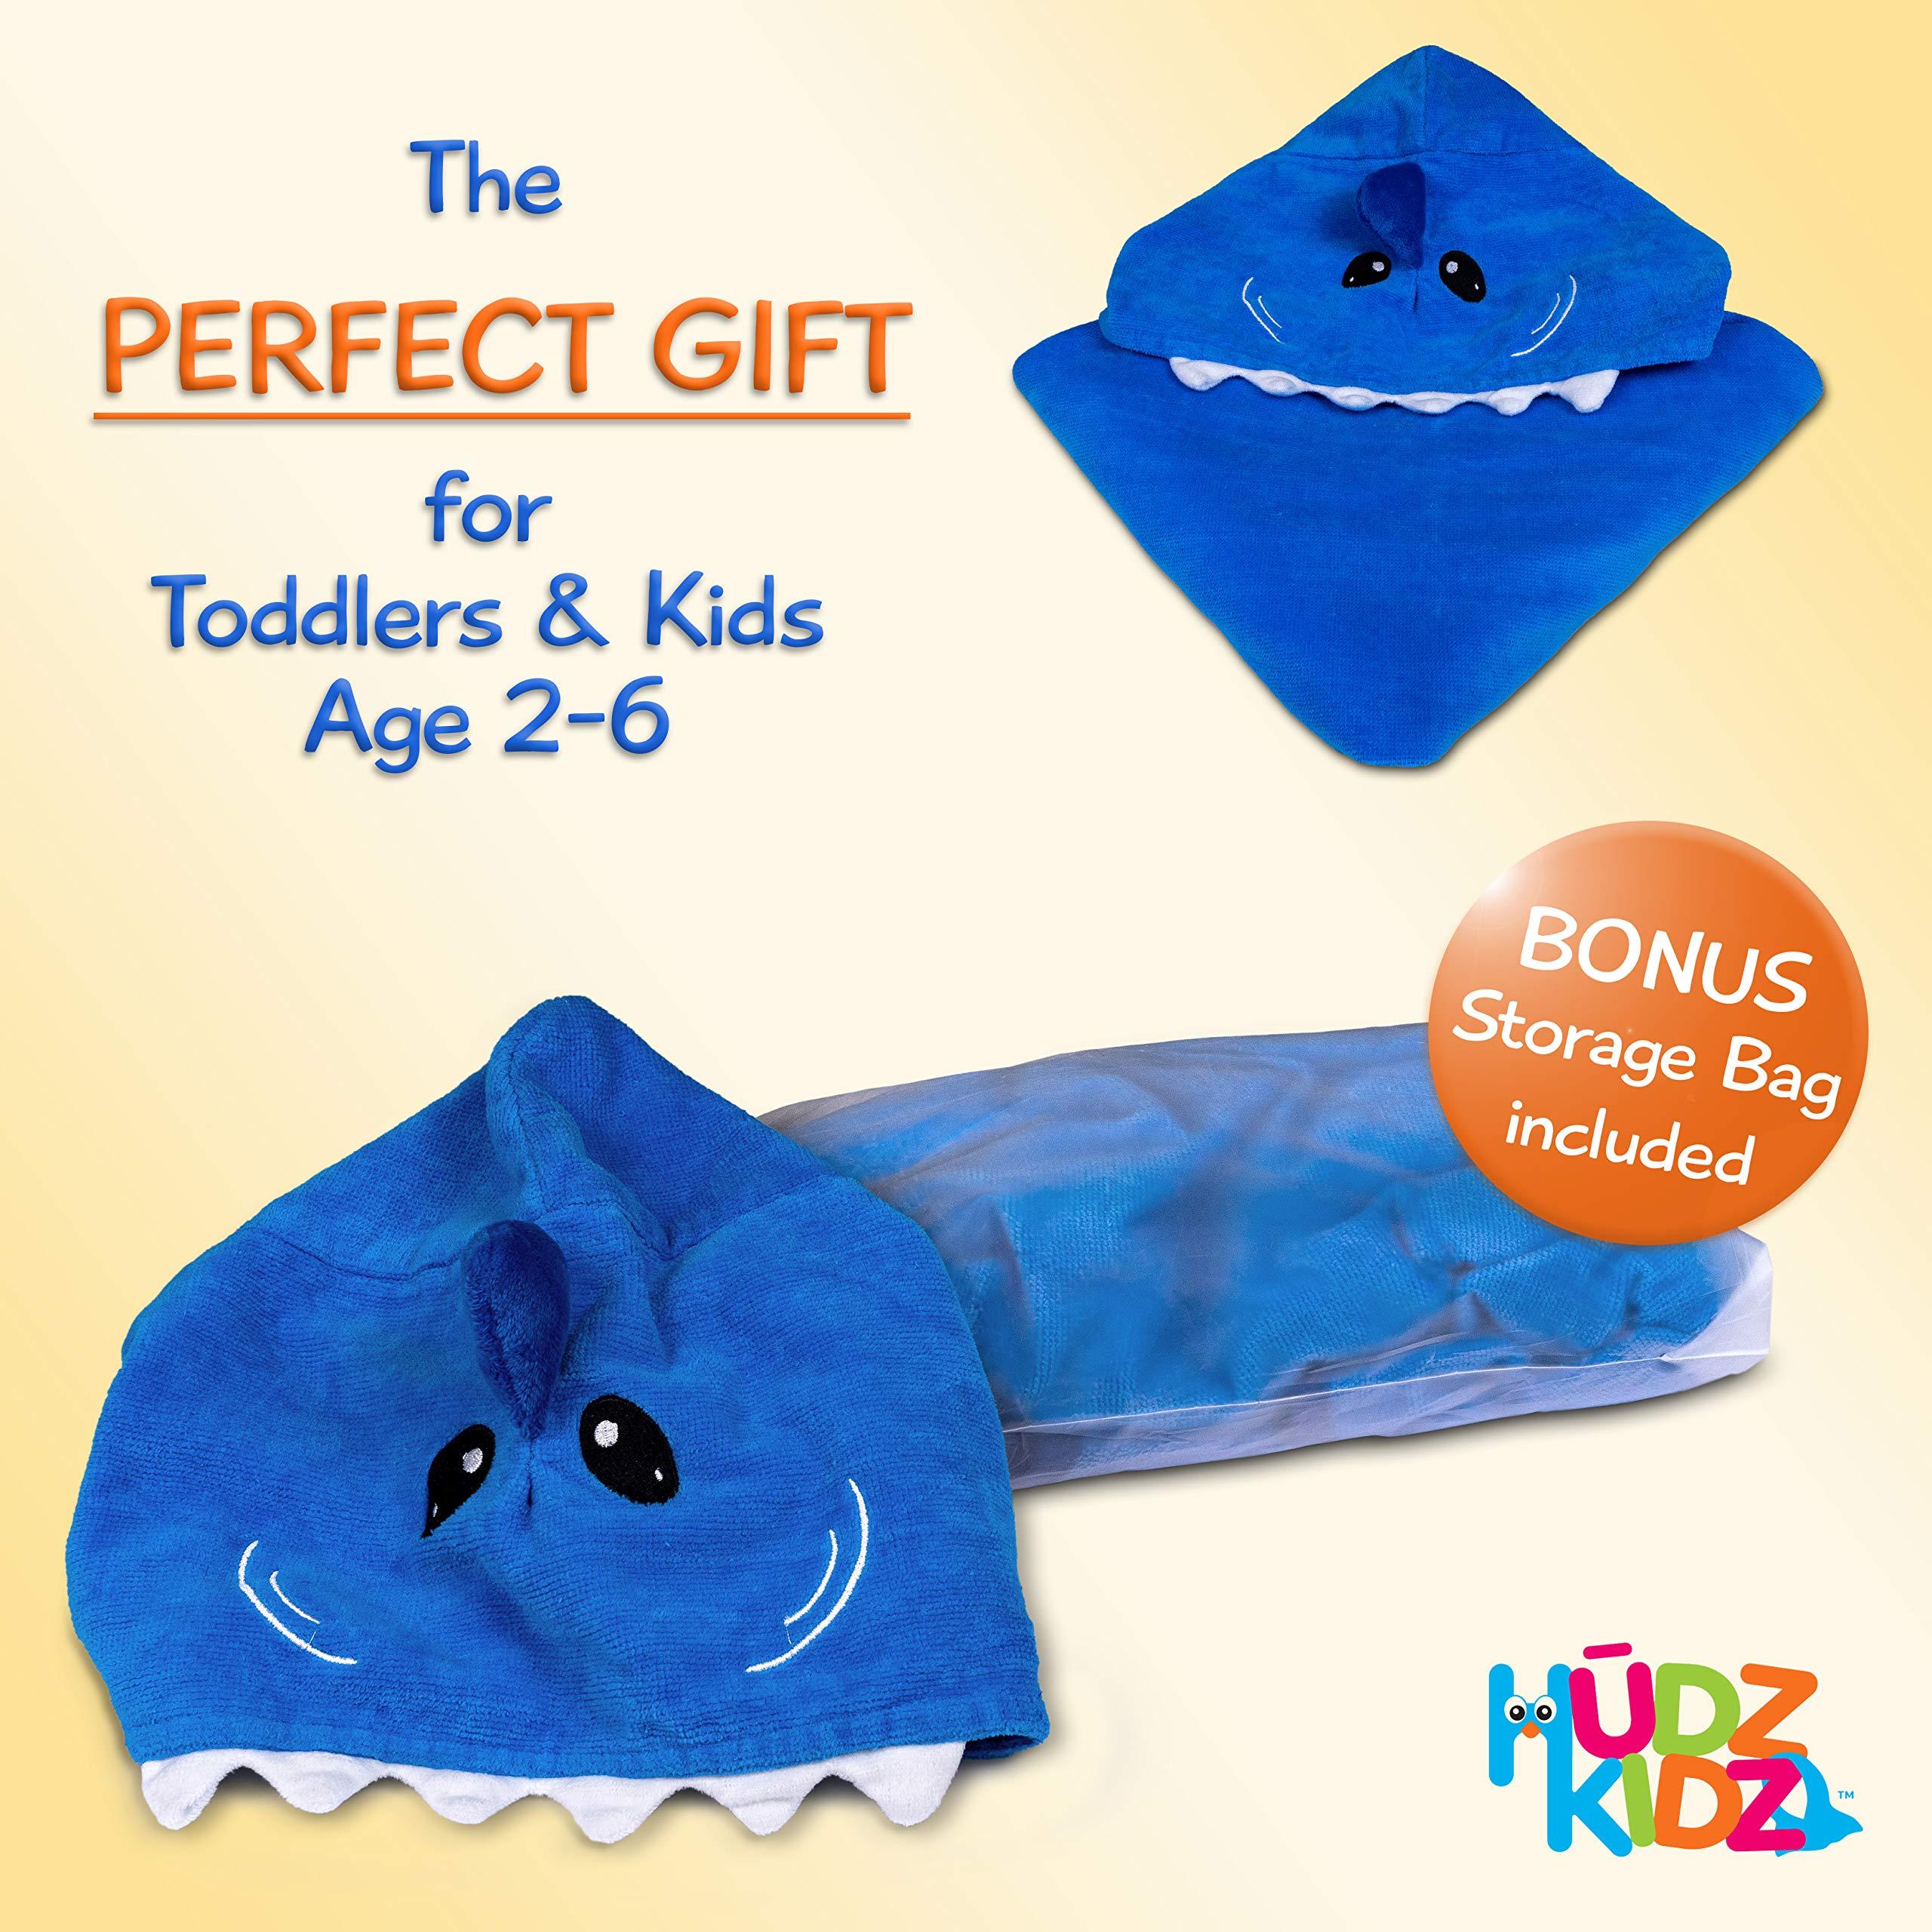 Hudz Kidz Hooded Towel for Kids & Toddlers, Ideal at Bath, Beach, Pool by Hudz Kidz (Image #7)